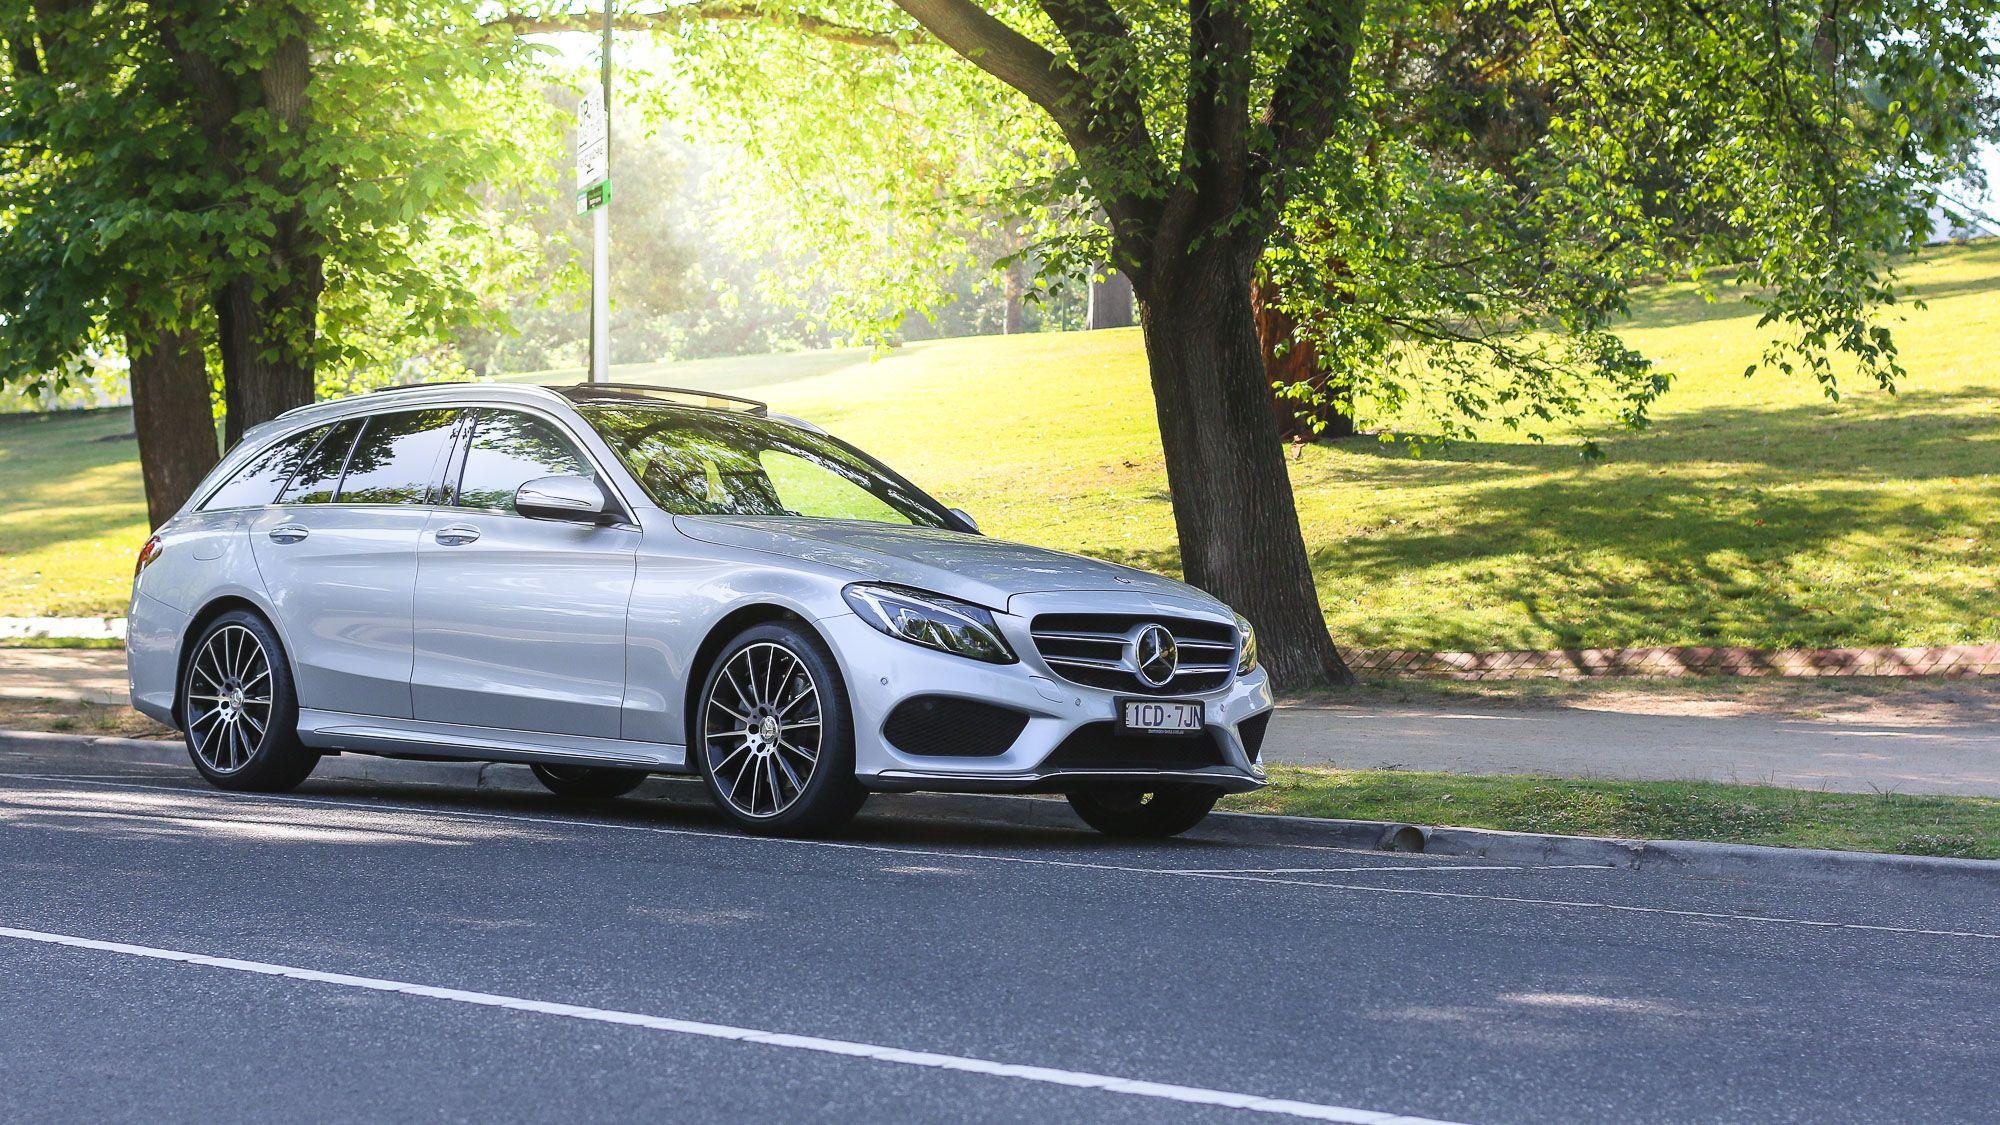 2015 Mercedes Benz C 200 Estate Review - http://www.caradvice.com.au/323484/2015-mercedes-benz-c-200-estate-review/